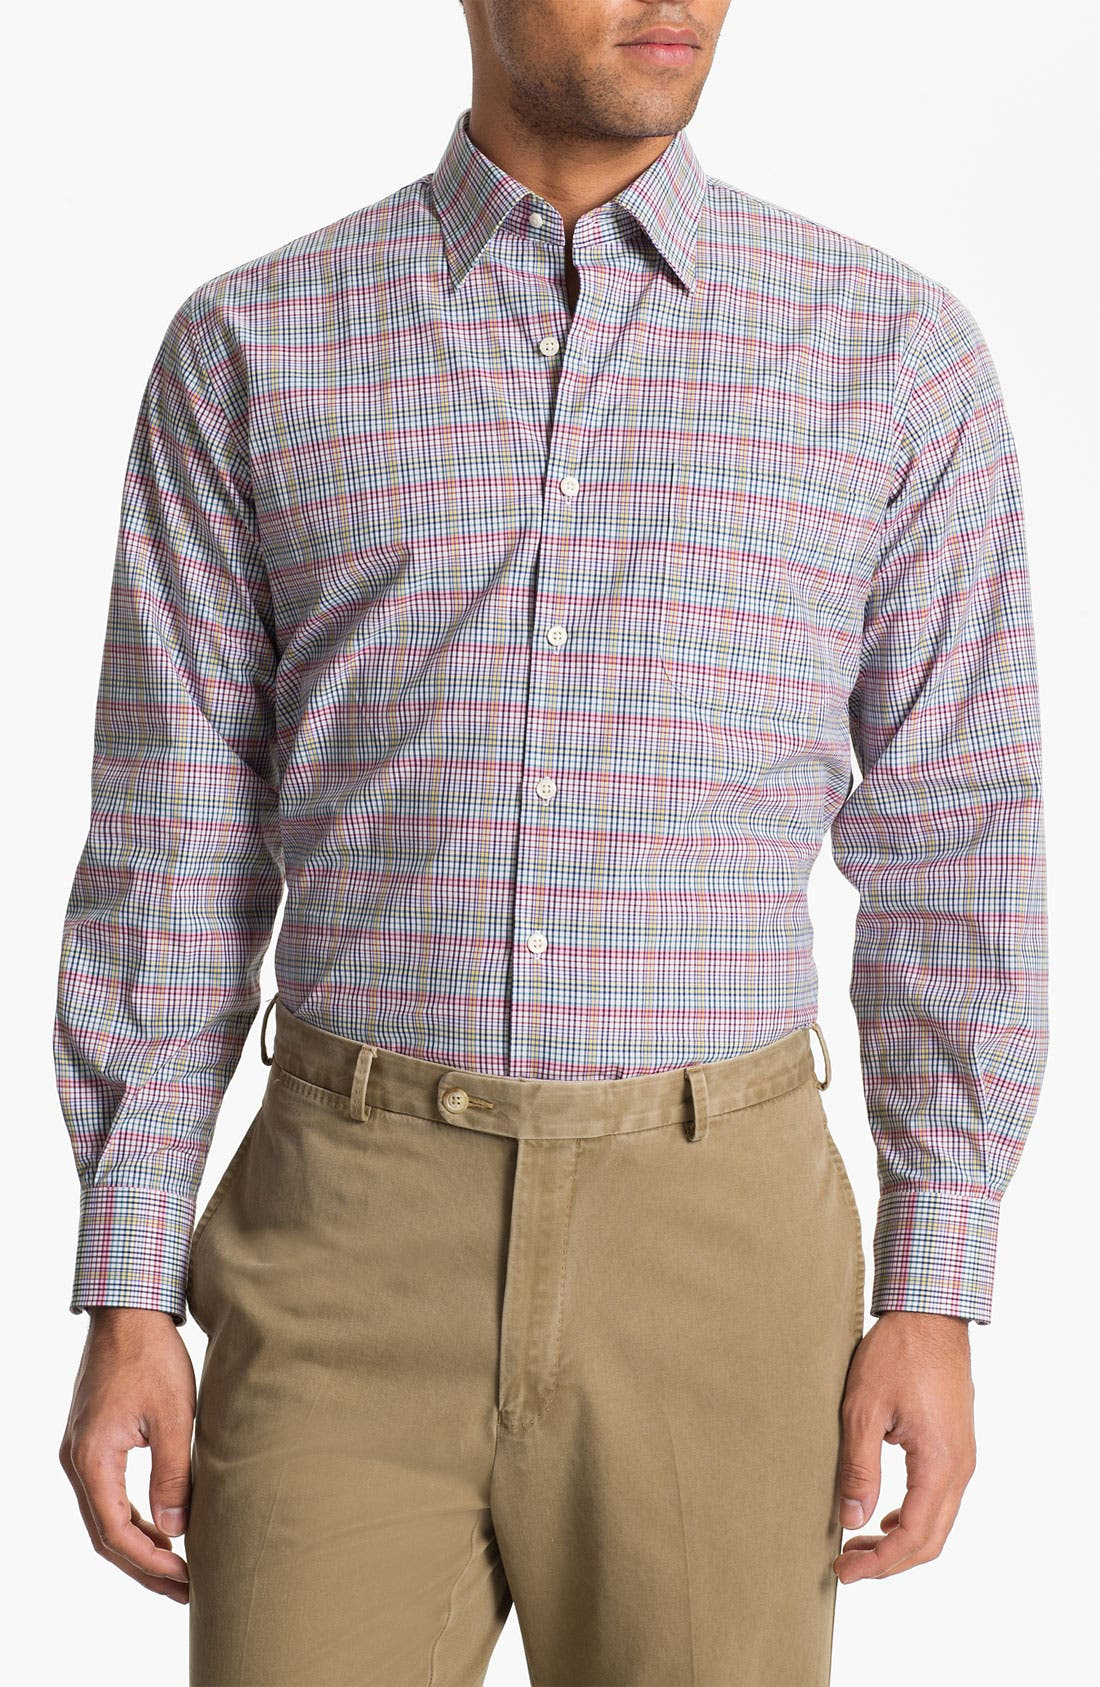 Alternate Image 1 Selected - Peter Millar 'Cypress' Regular Fit Sport Shirt